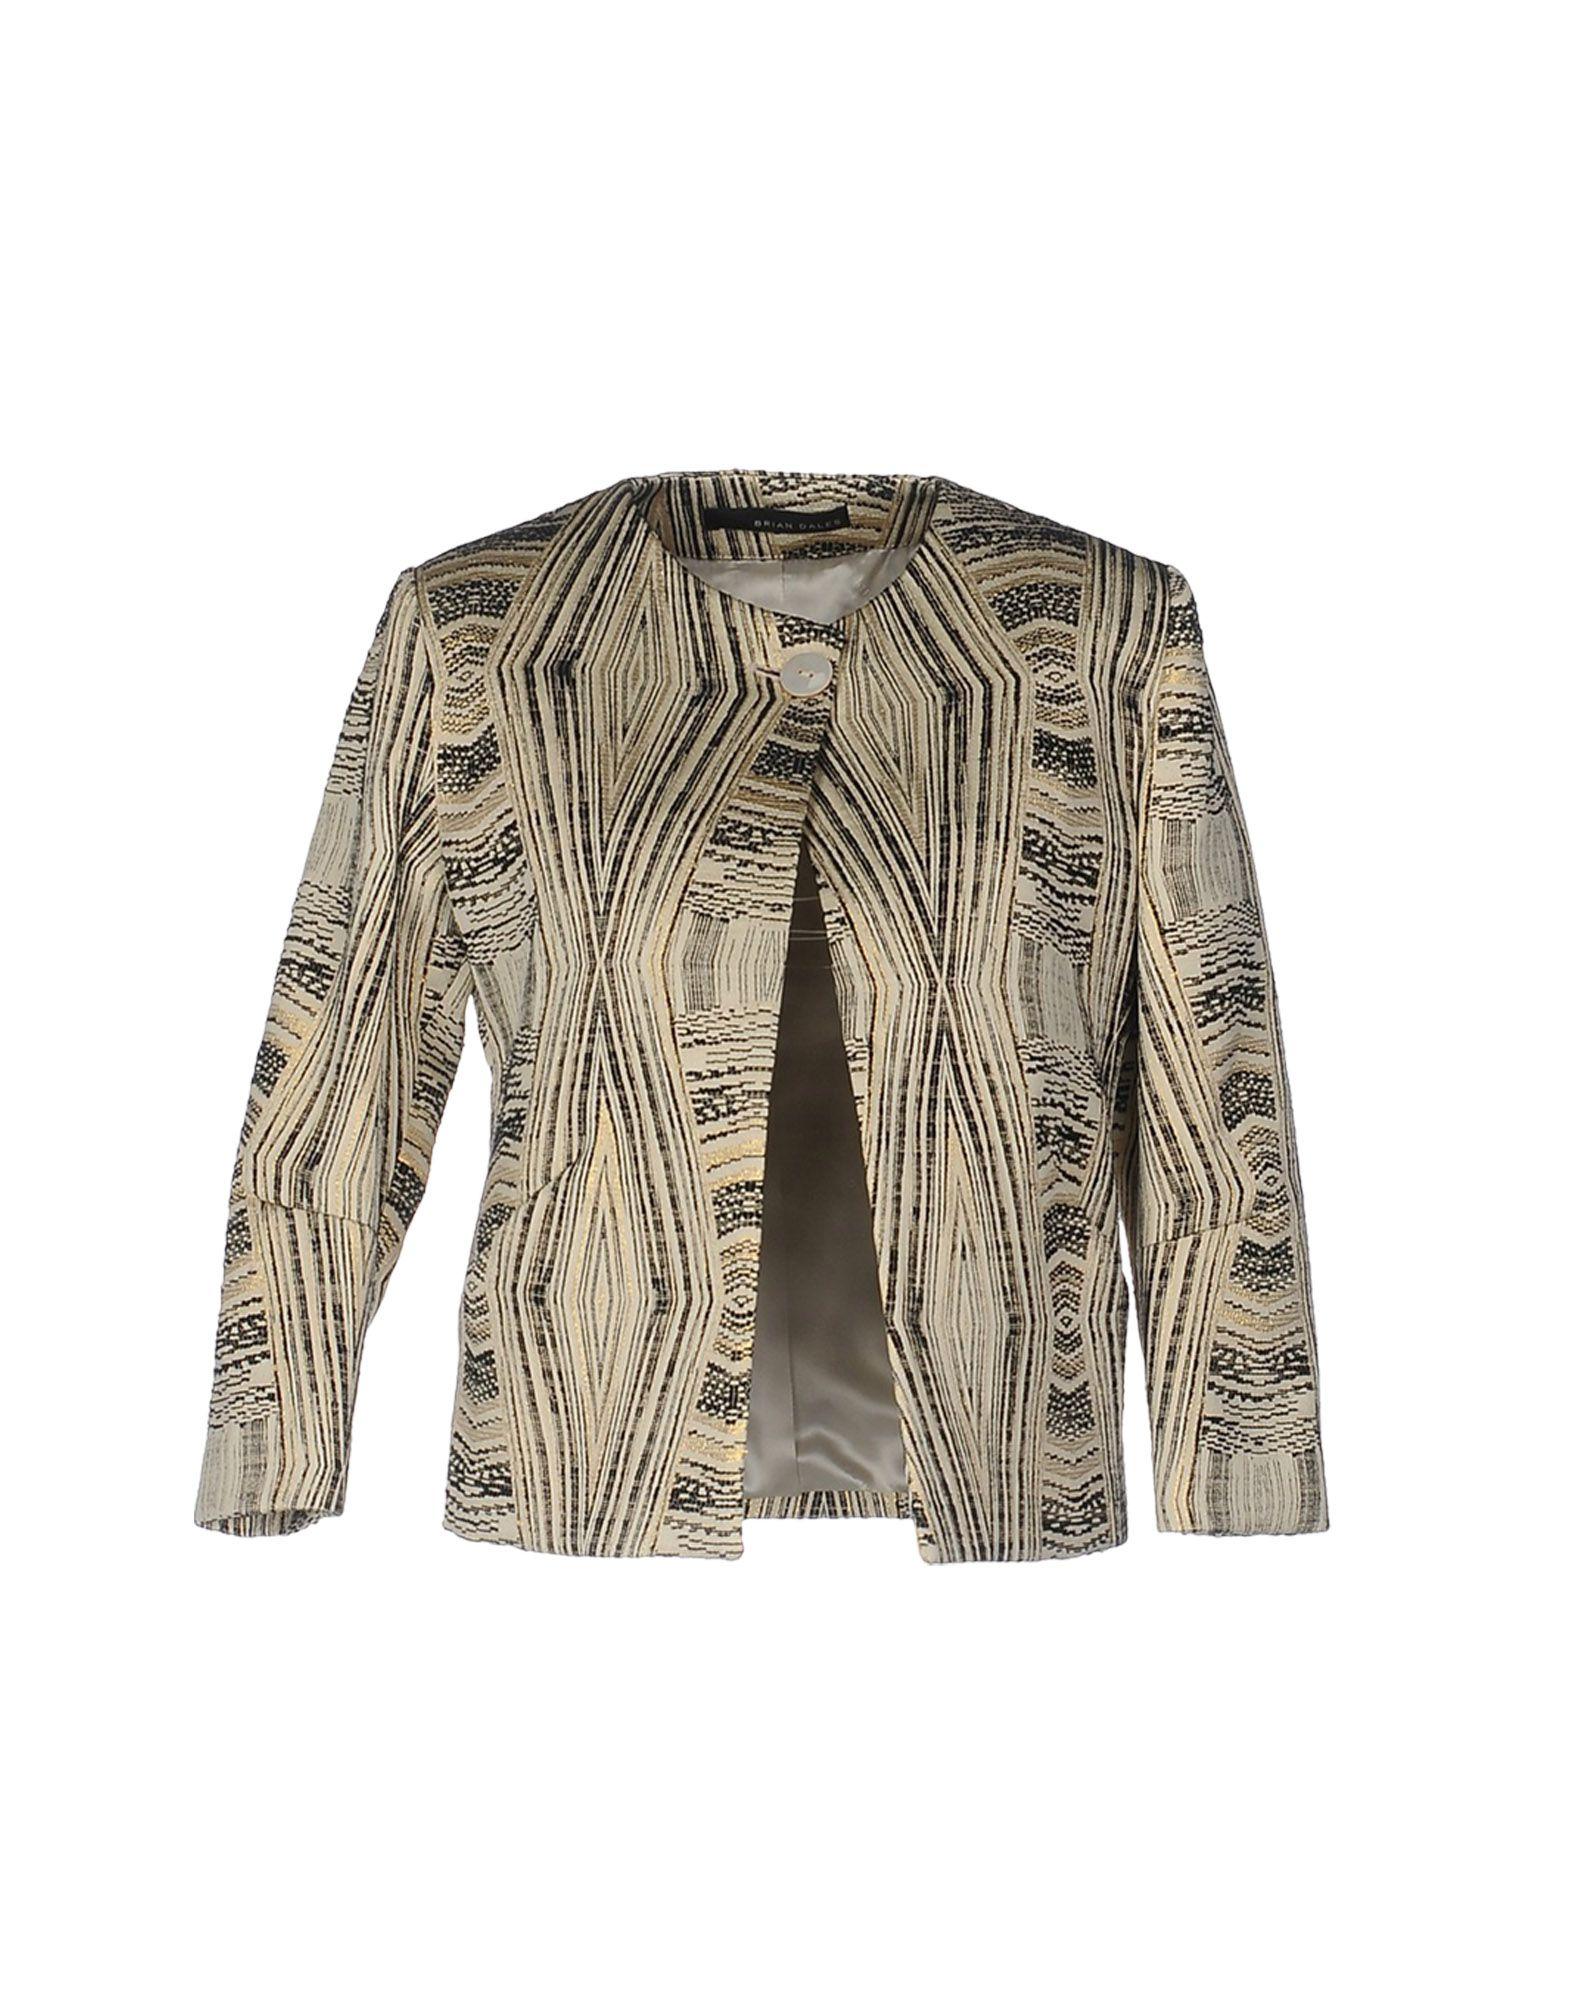 ФОТО brian dales пиджак